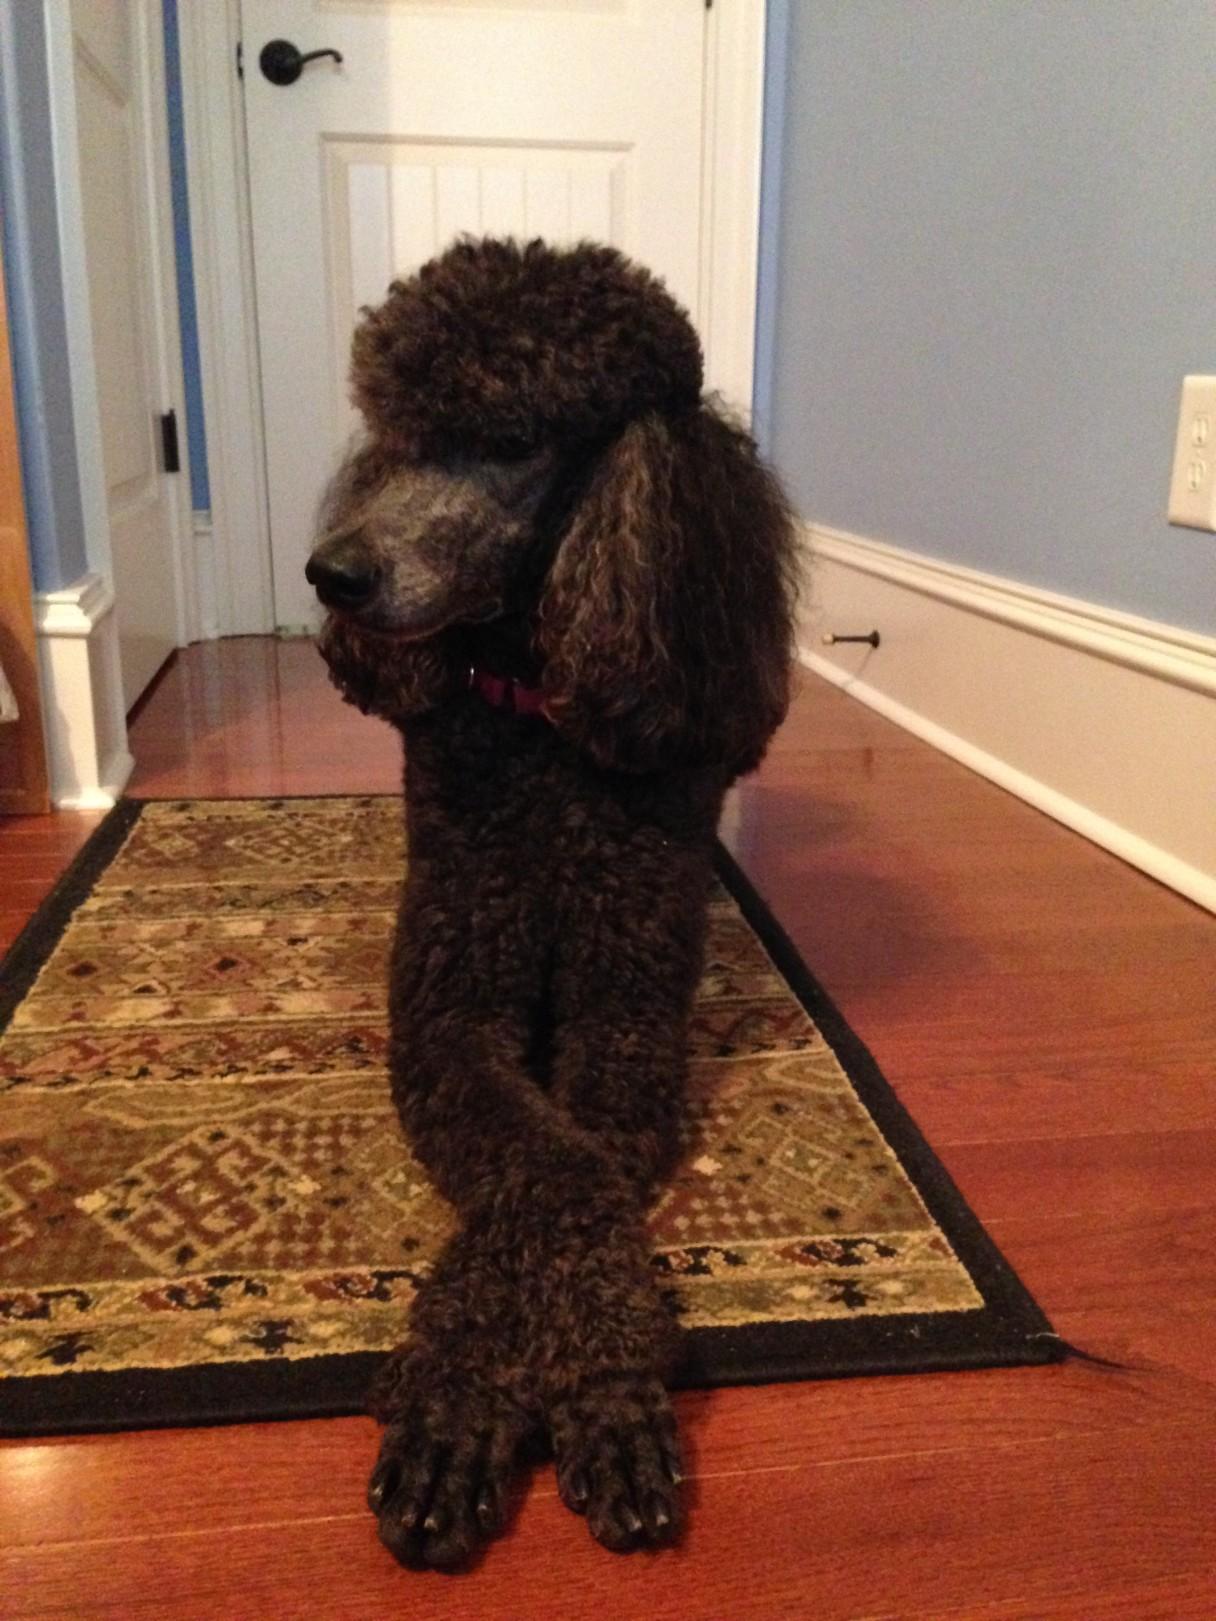 Dog crossing legs